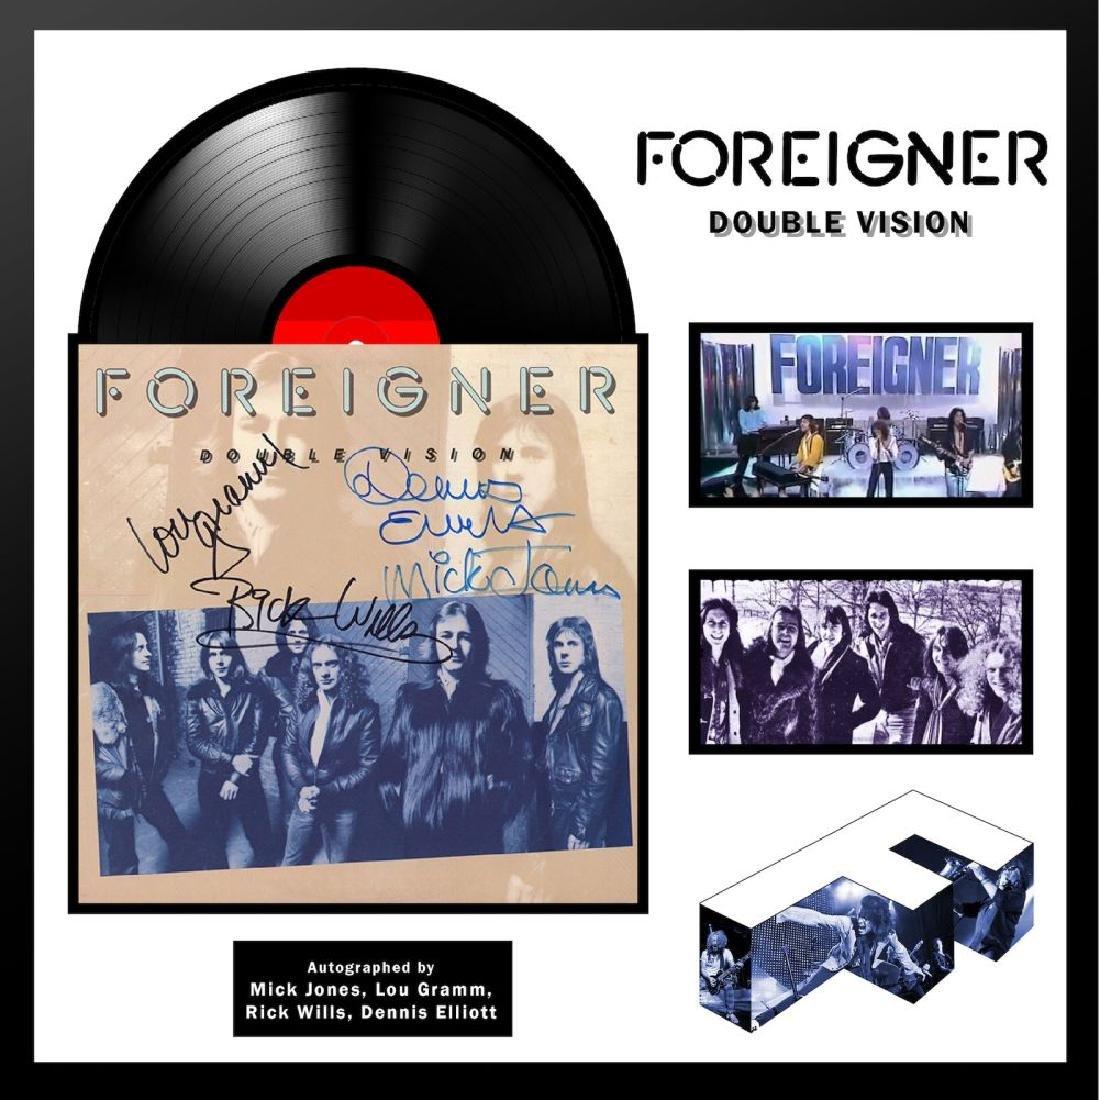 Foreigner Double Vision Framed Album